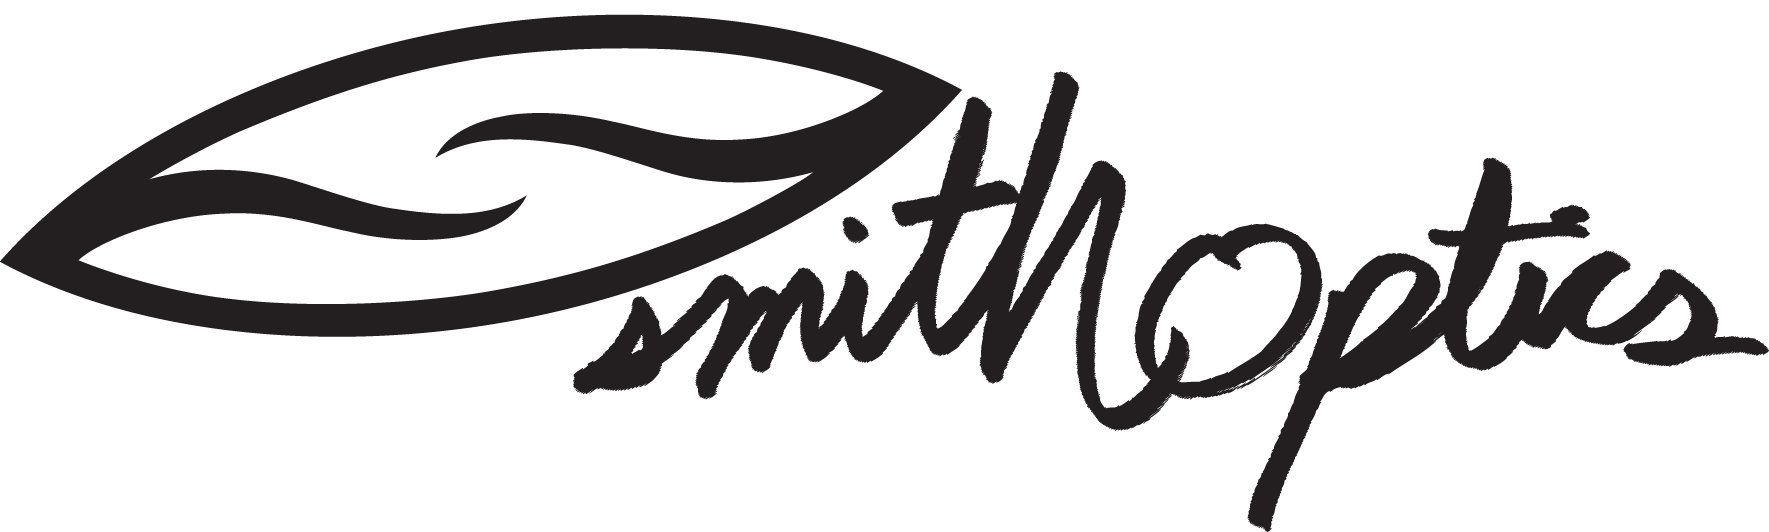 Smith Optics - Paddleboard Shop Cape Ann